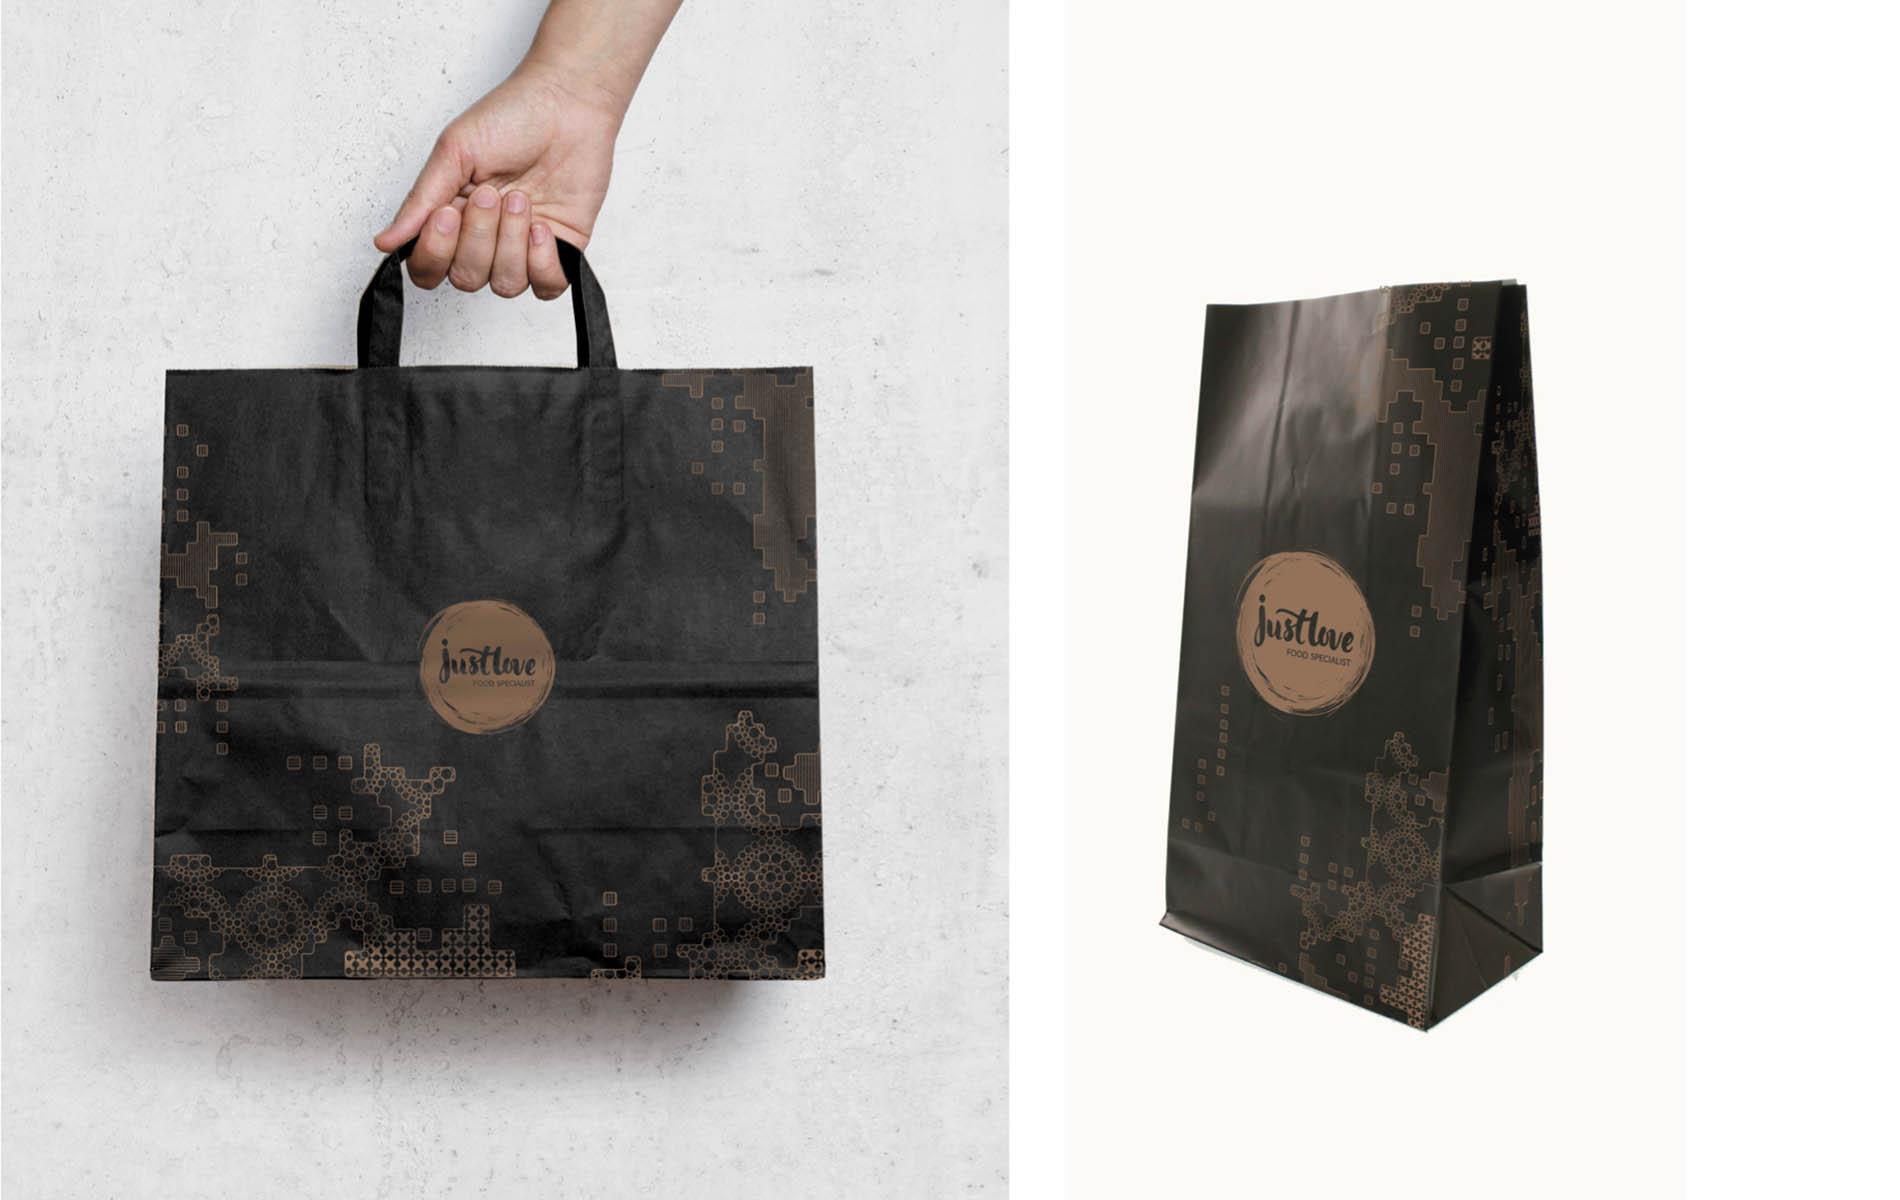 mintlab-brandidentity-justlove-mockup-shopper